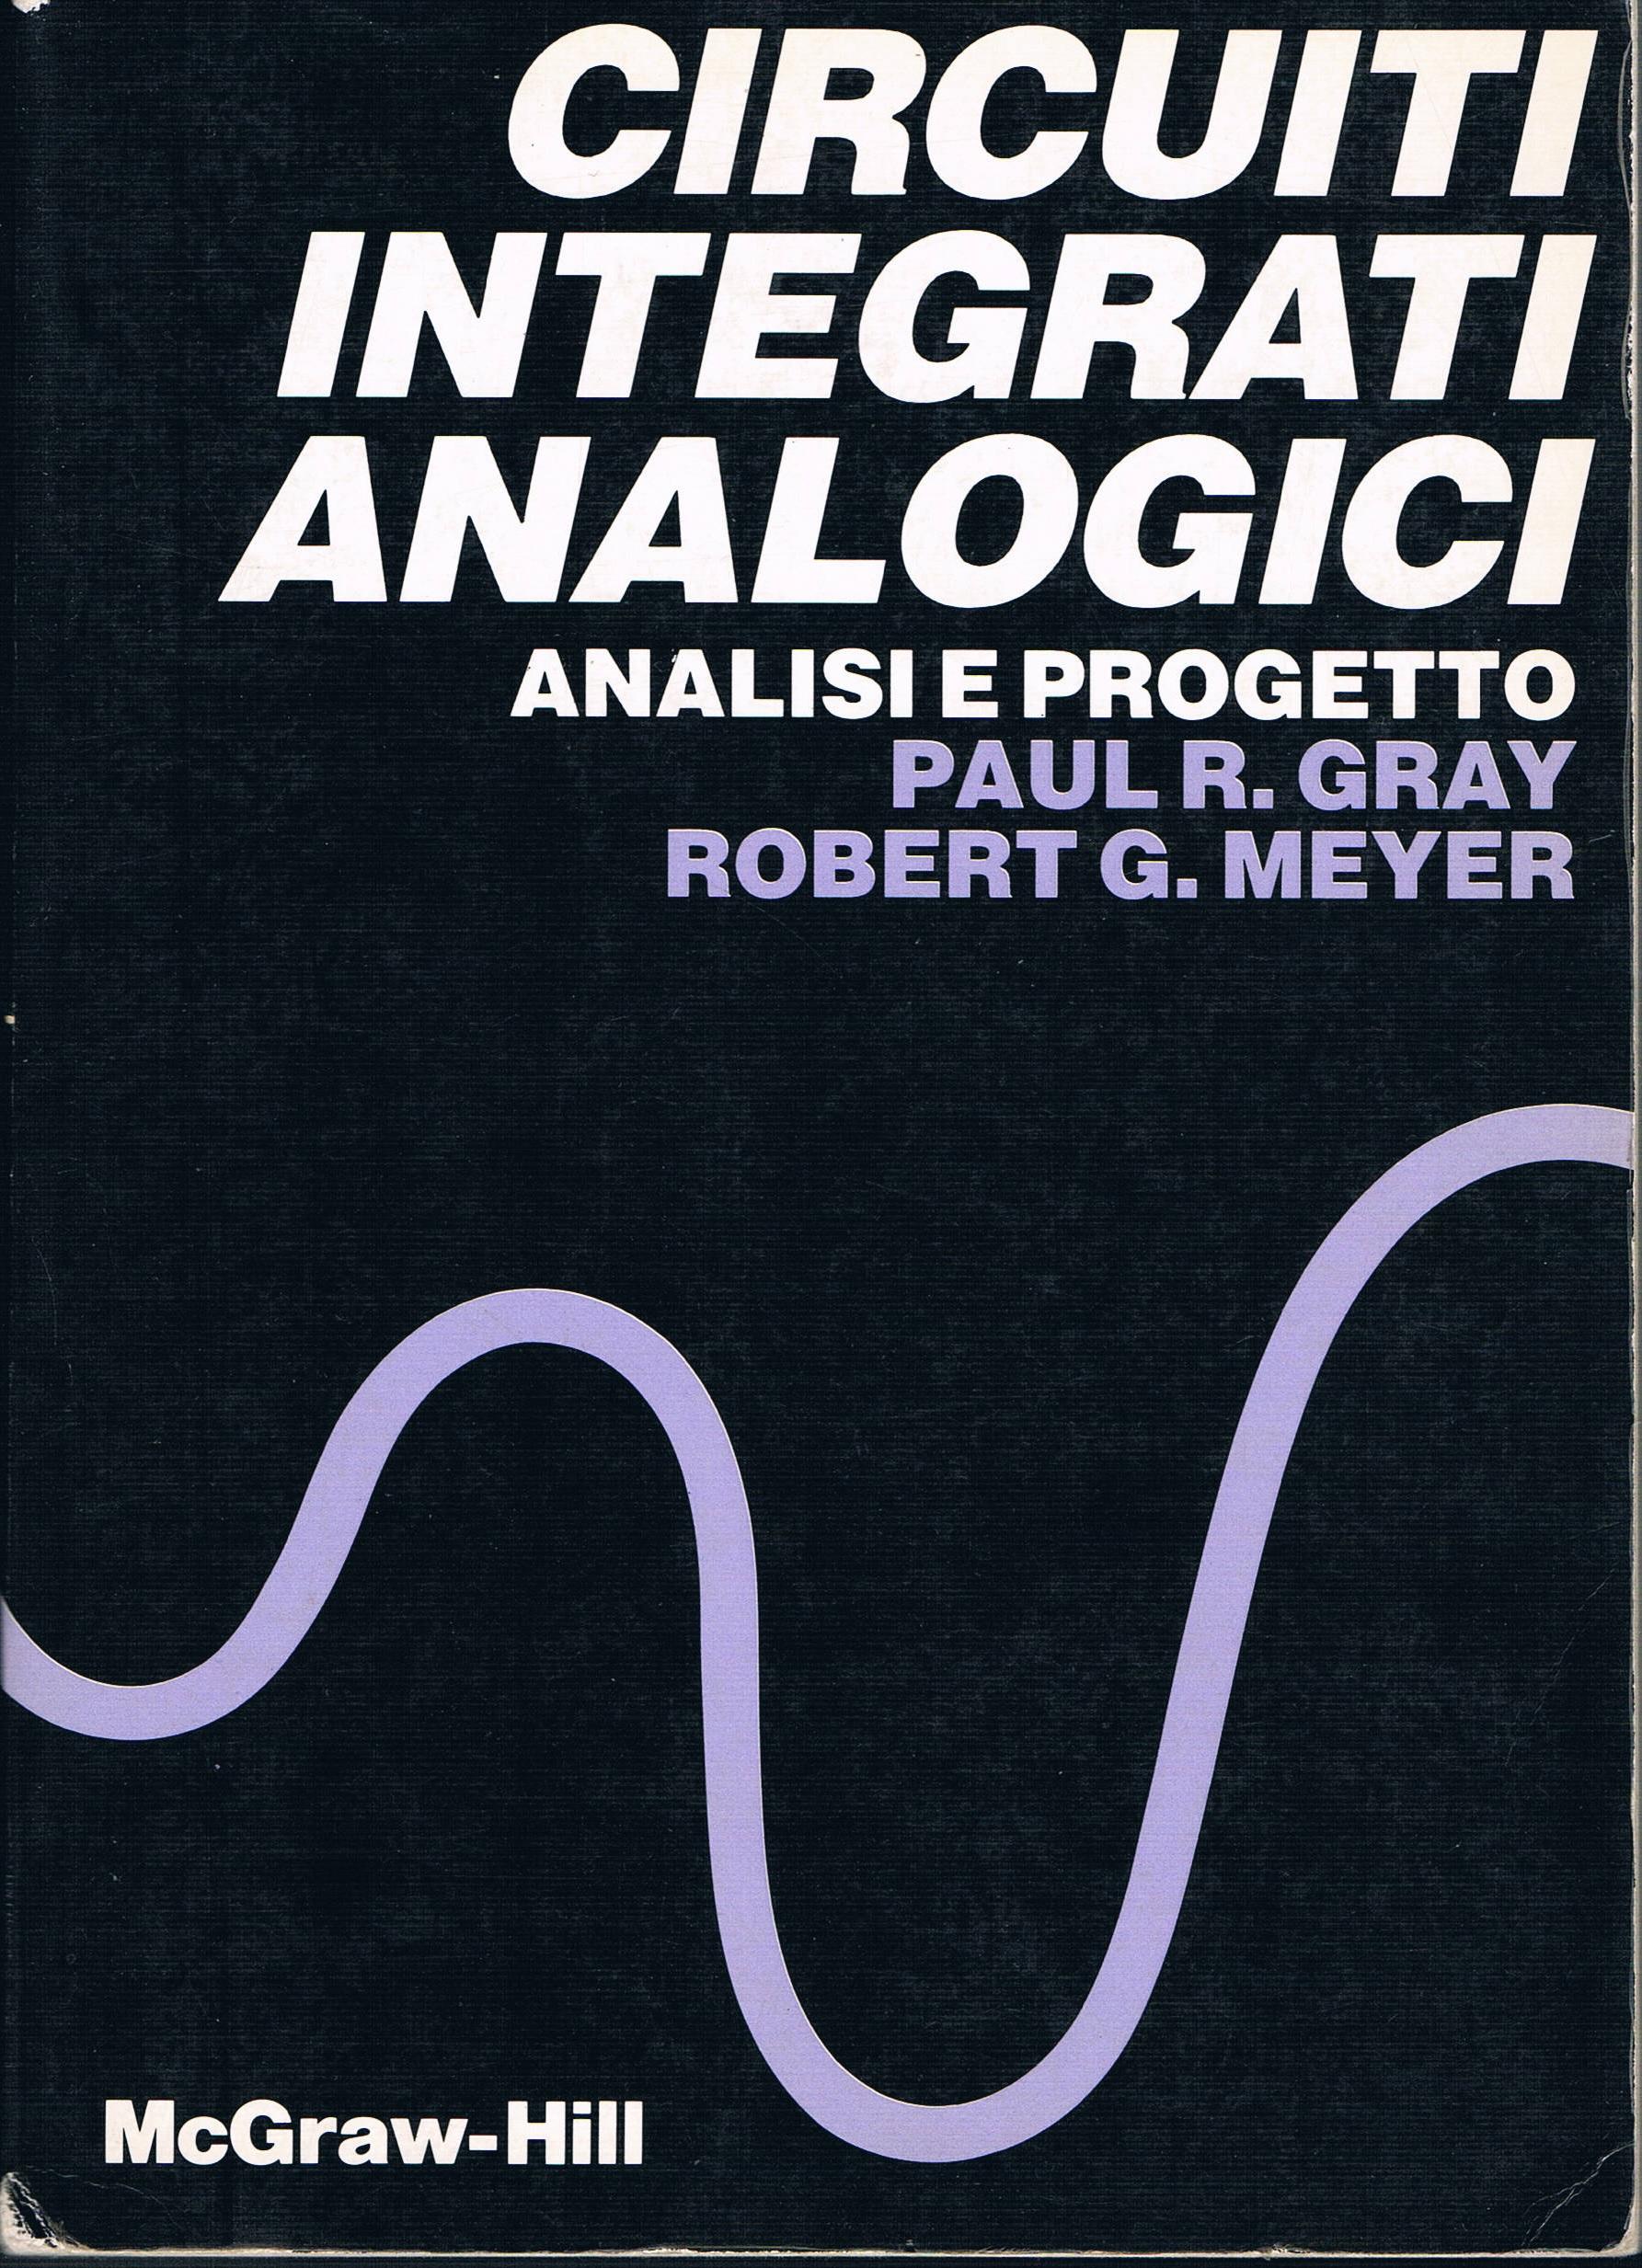 Circuiti integrati analogici